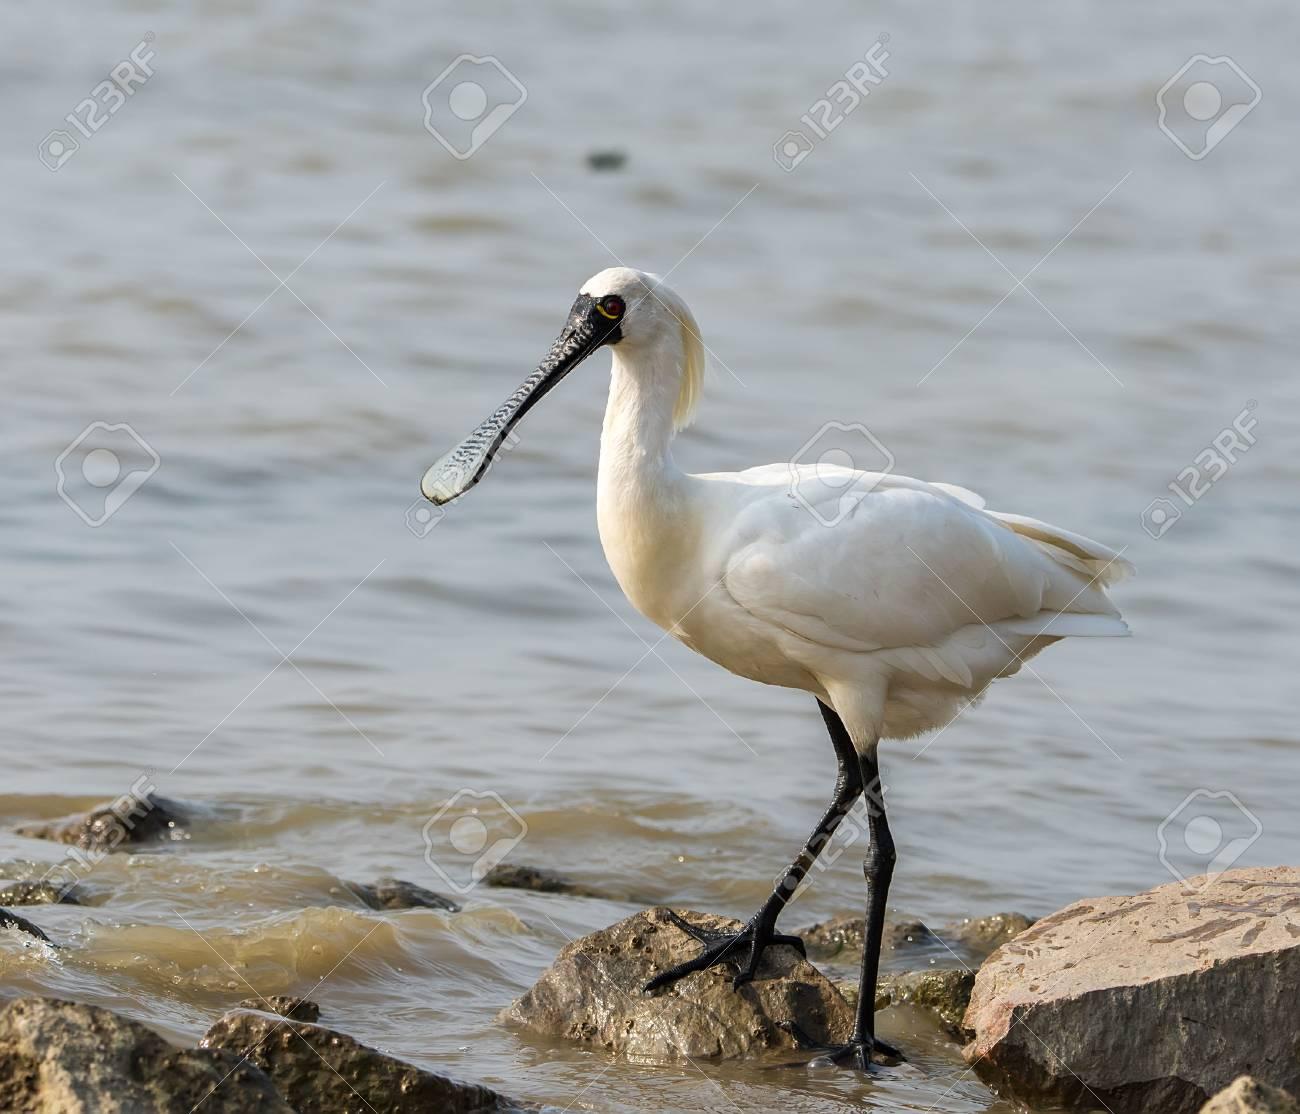 Black-faced Spoonbill in waterland. - 64998990